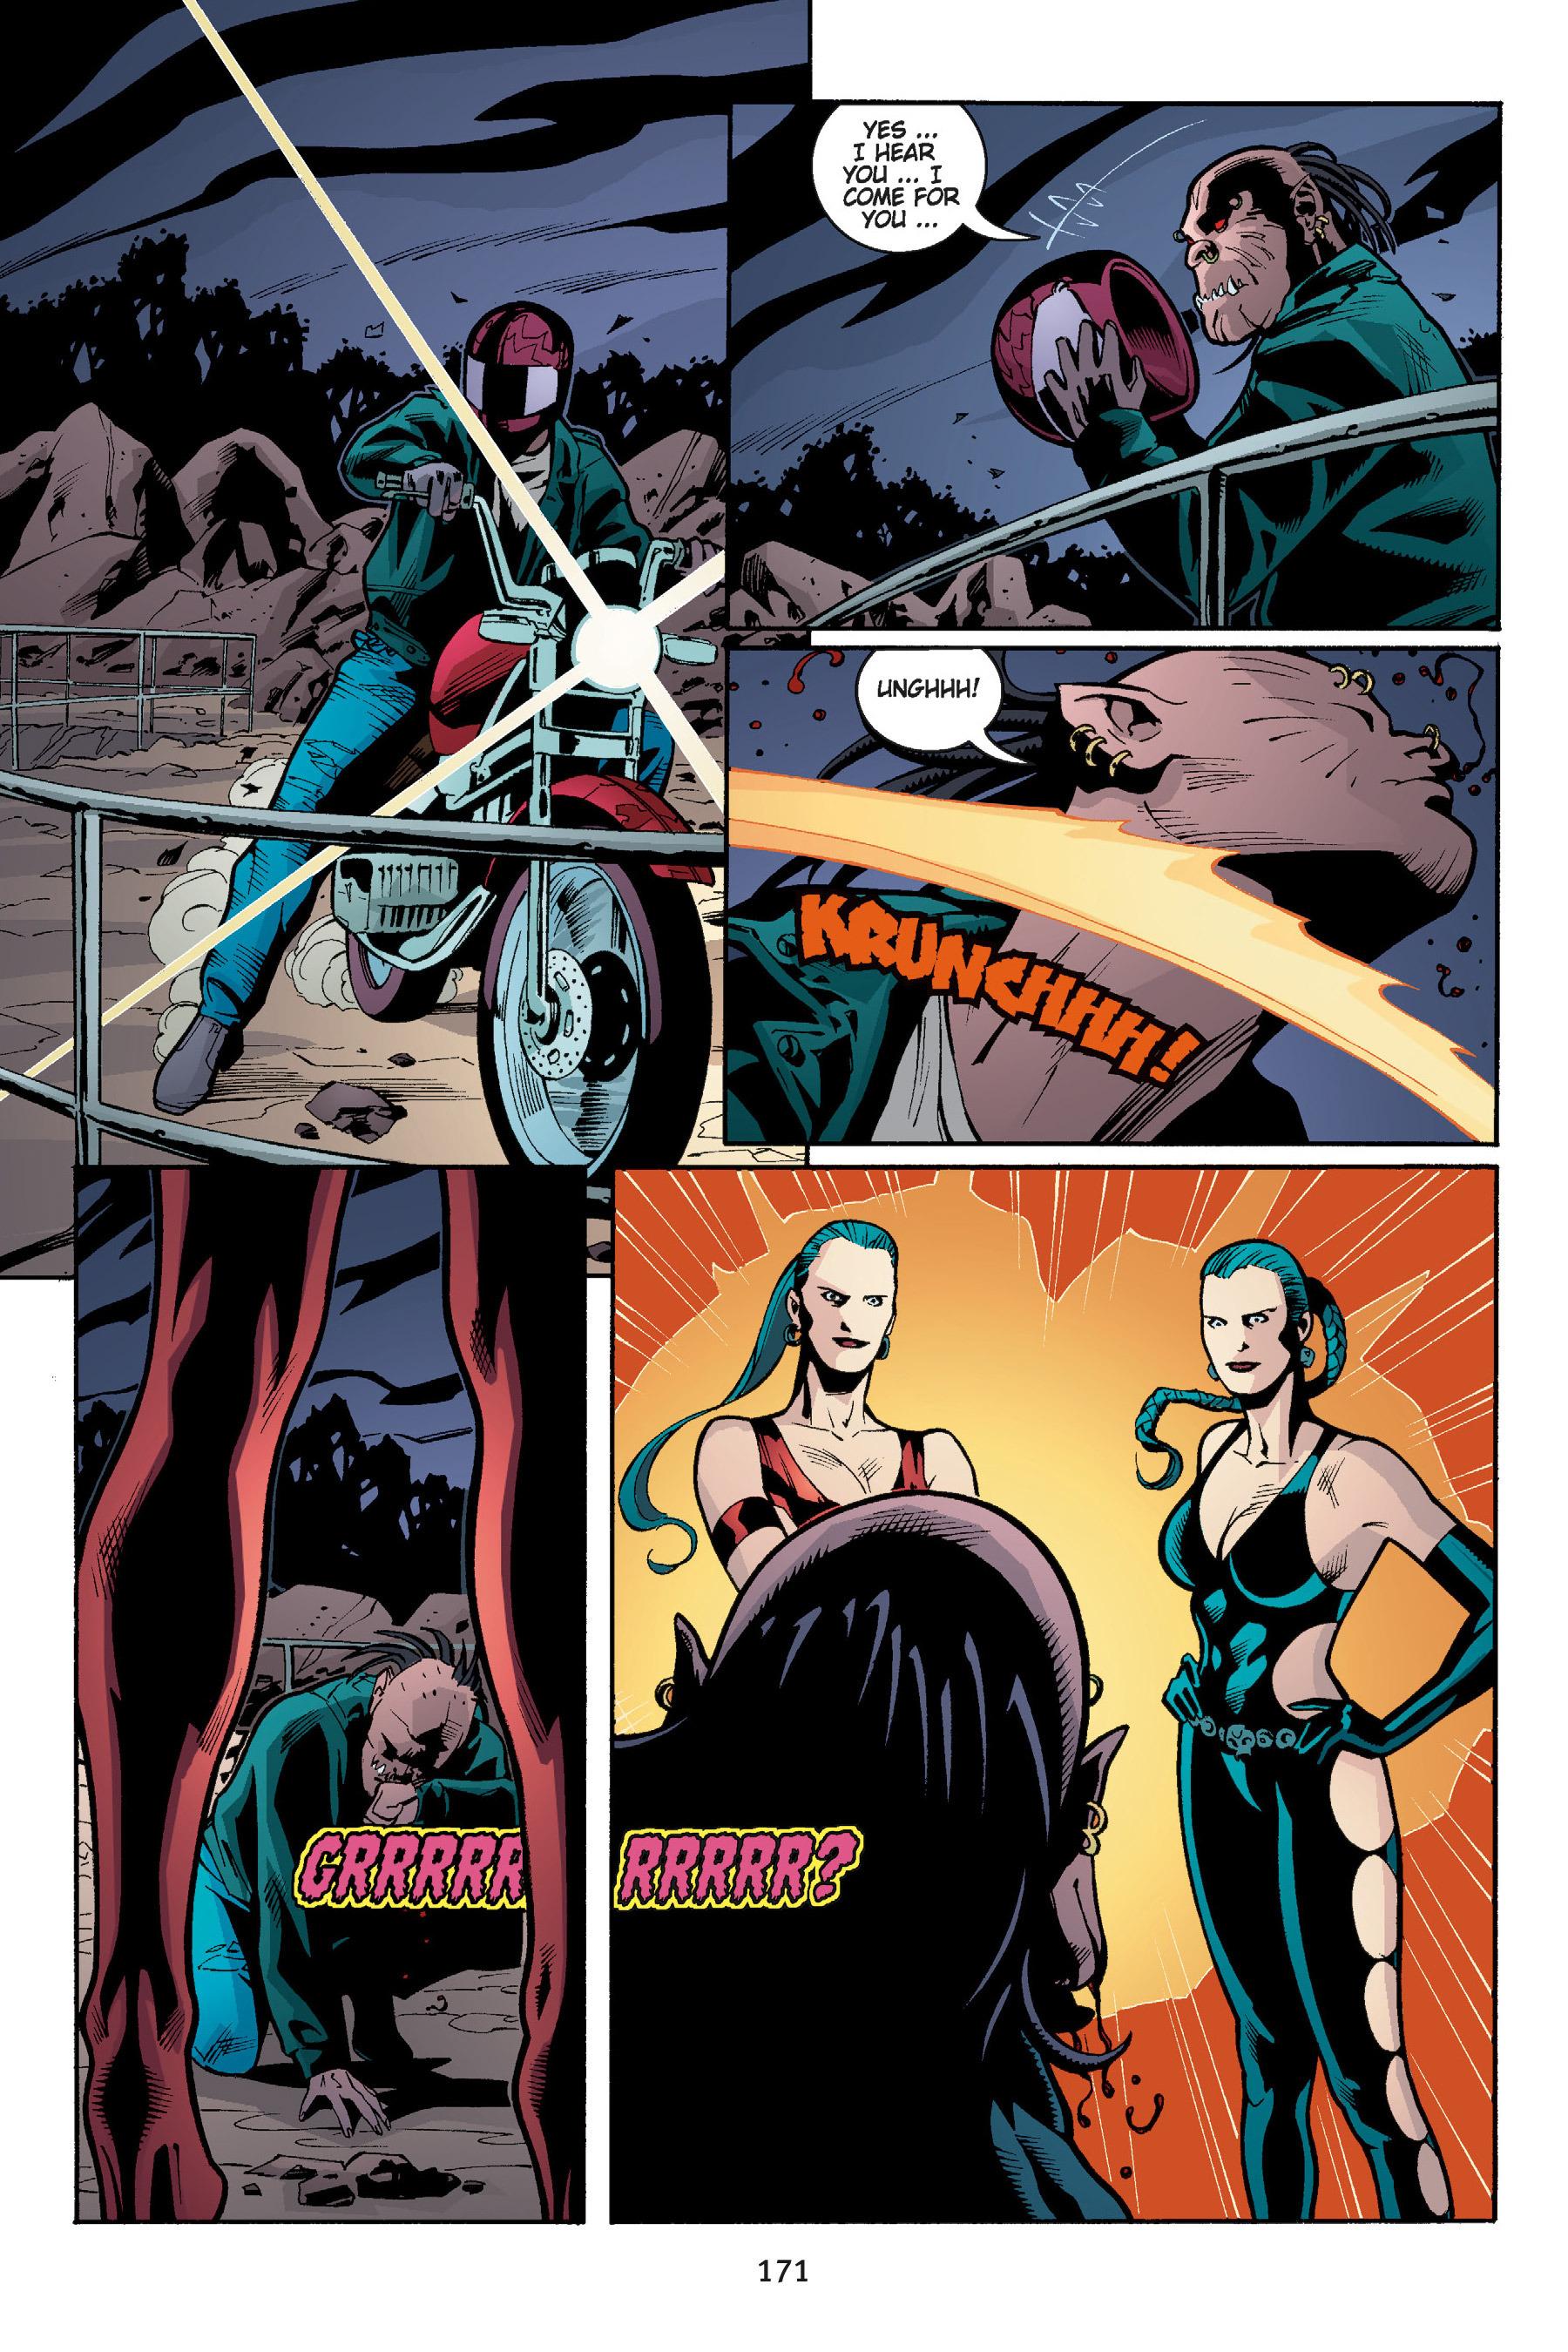 Read online Buffy the Vampire Slayer: Omnibus comic -  Issue # TPB 5 - 171